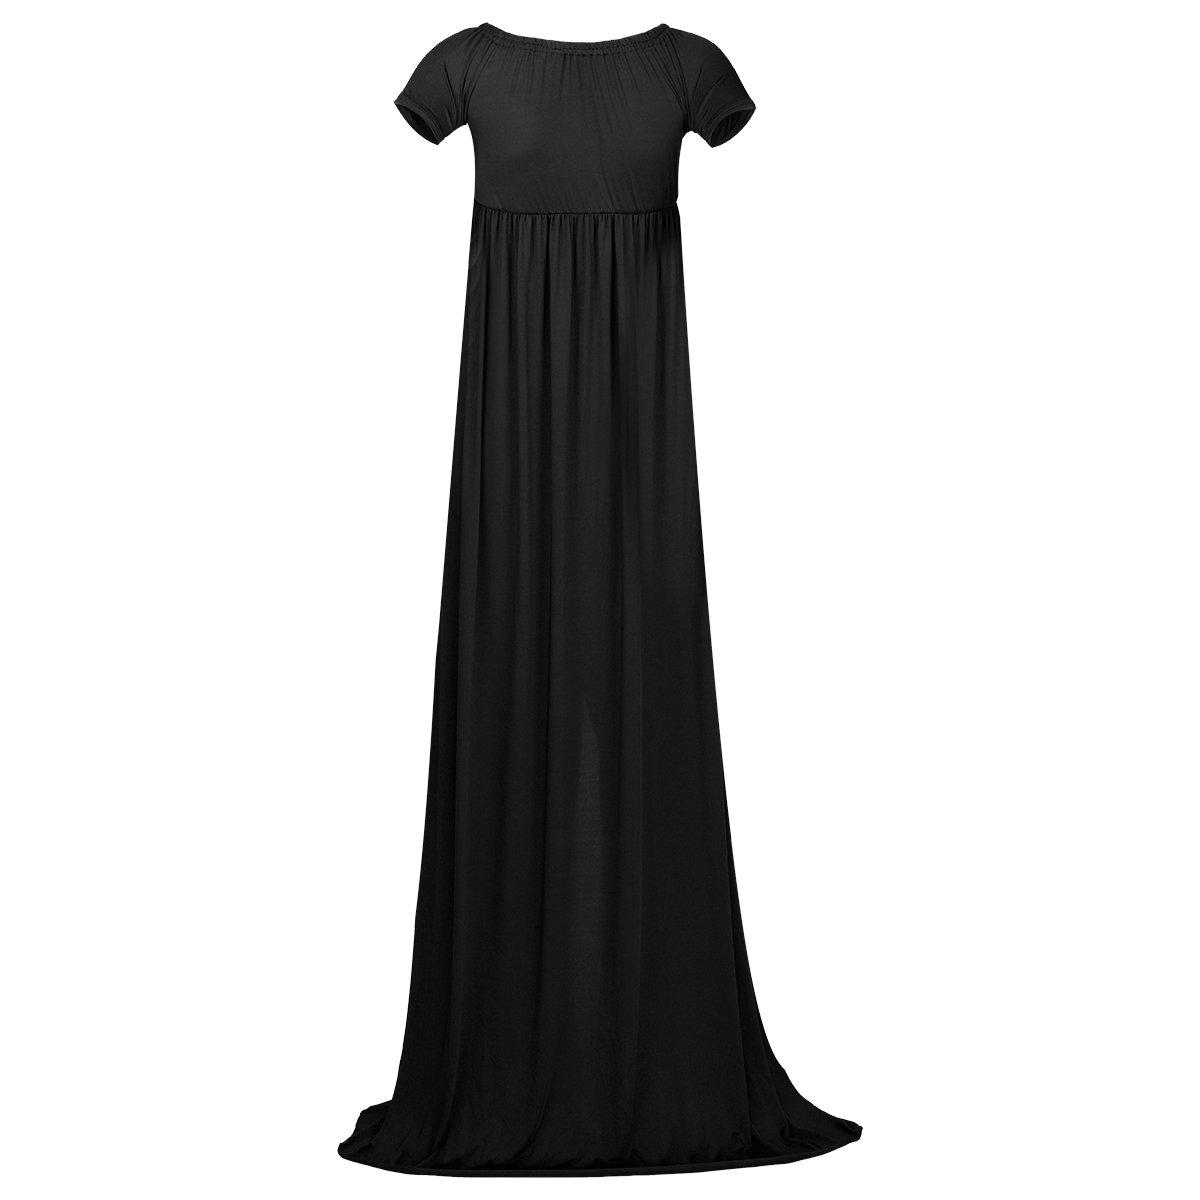 c79f673e5e Short Sleeve Cotton Wrap Dress – DACC